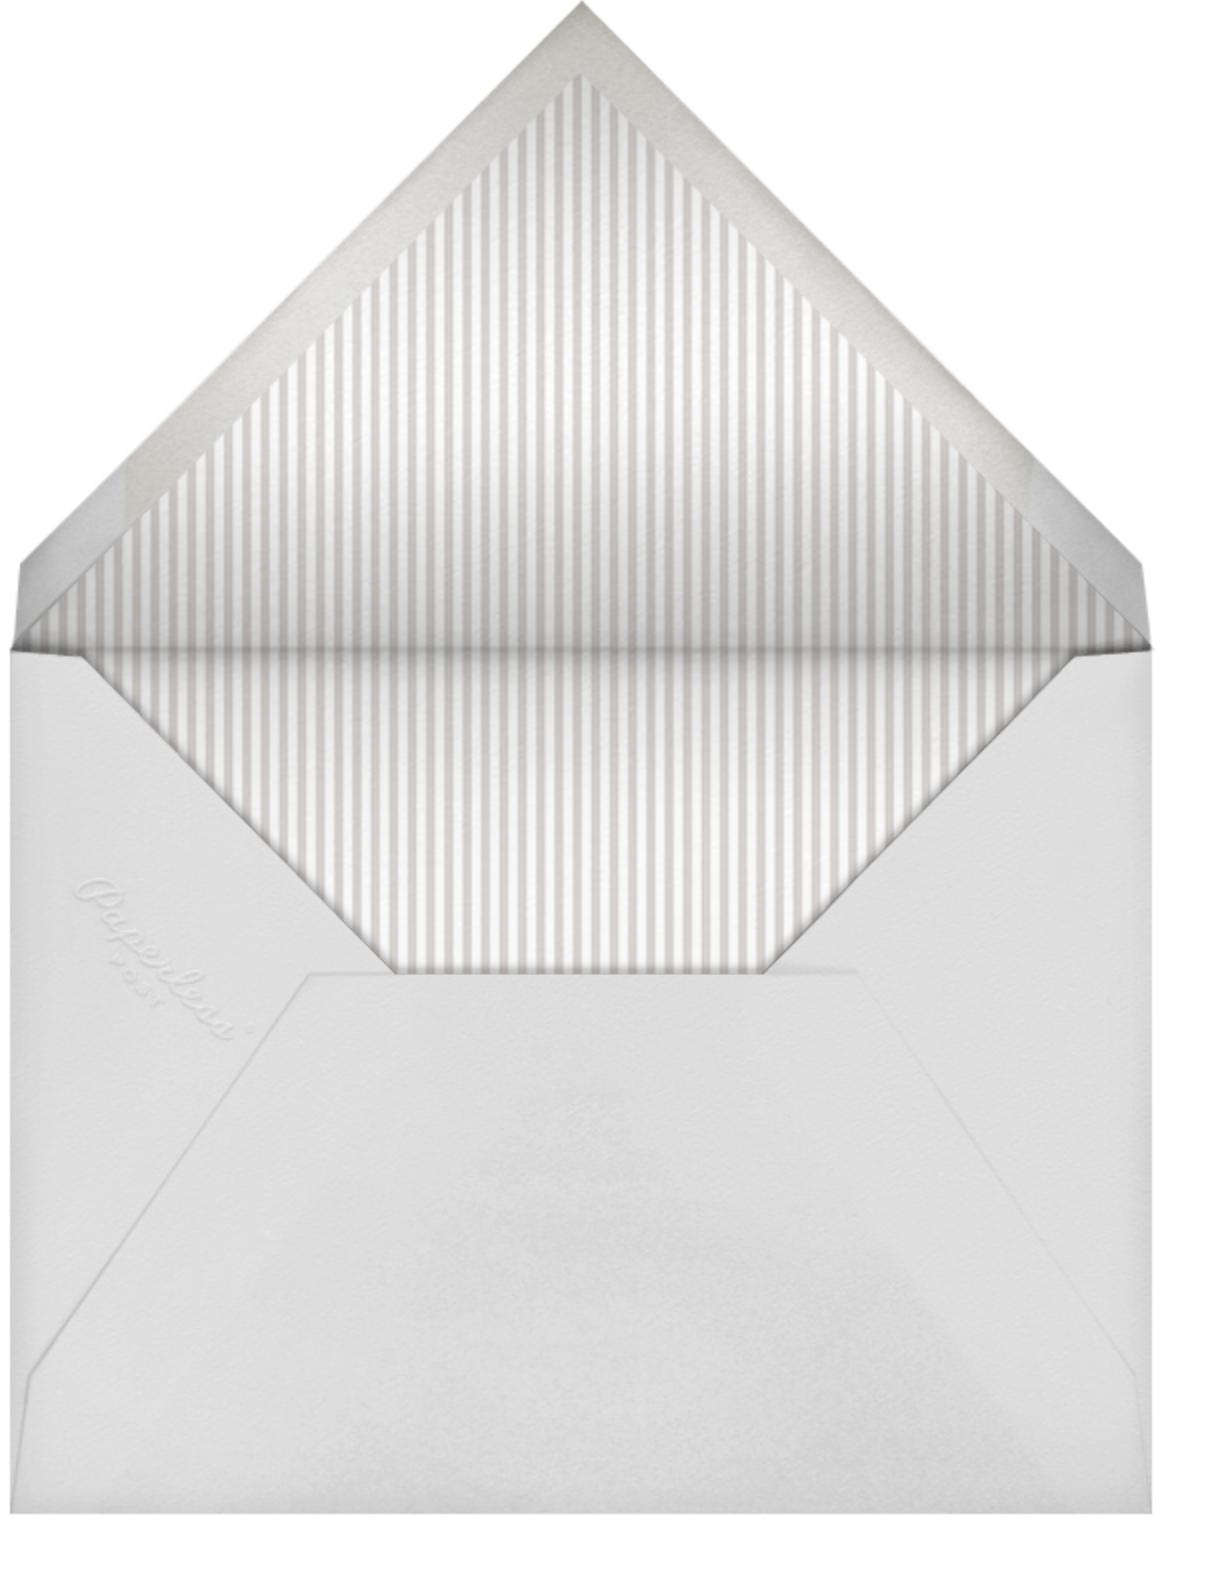 Swiss Dot Shower - Gray - Sugar Paper - Bridal shower - envelope back